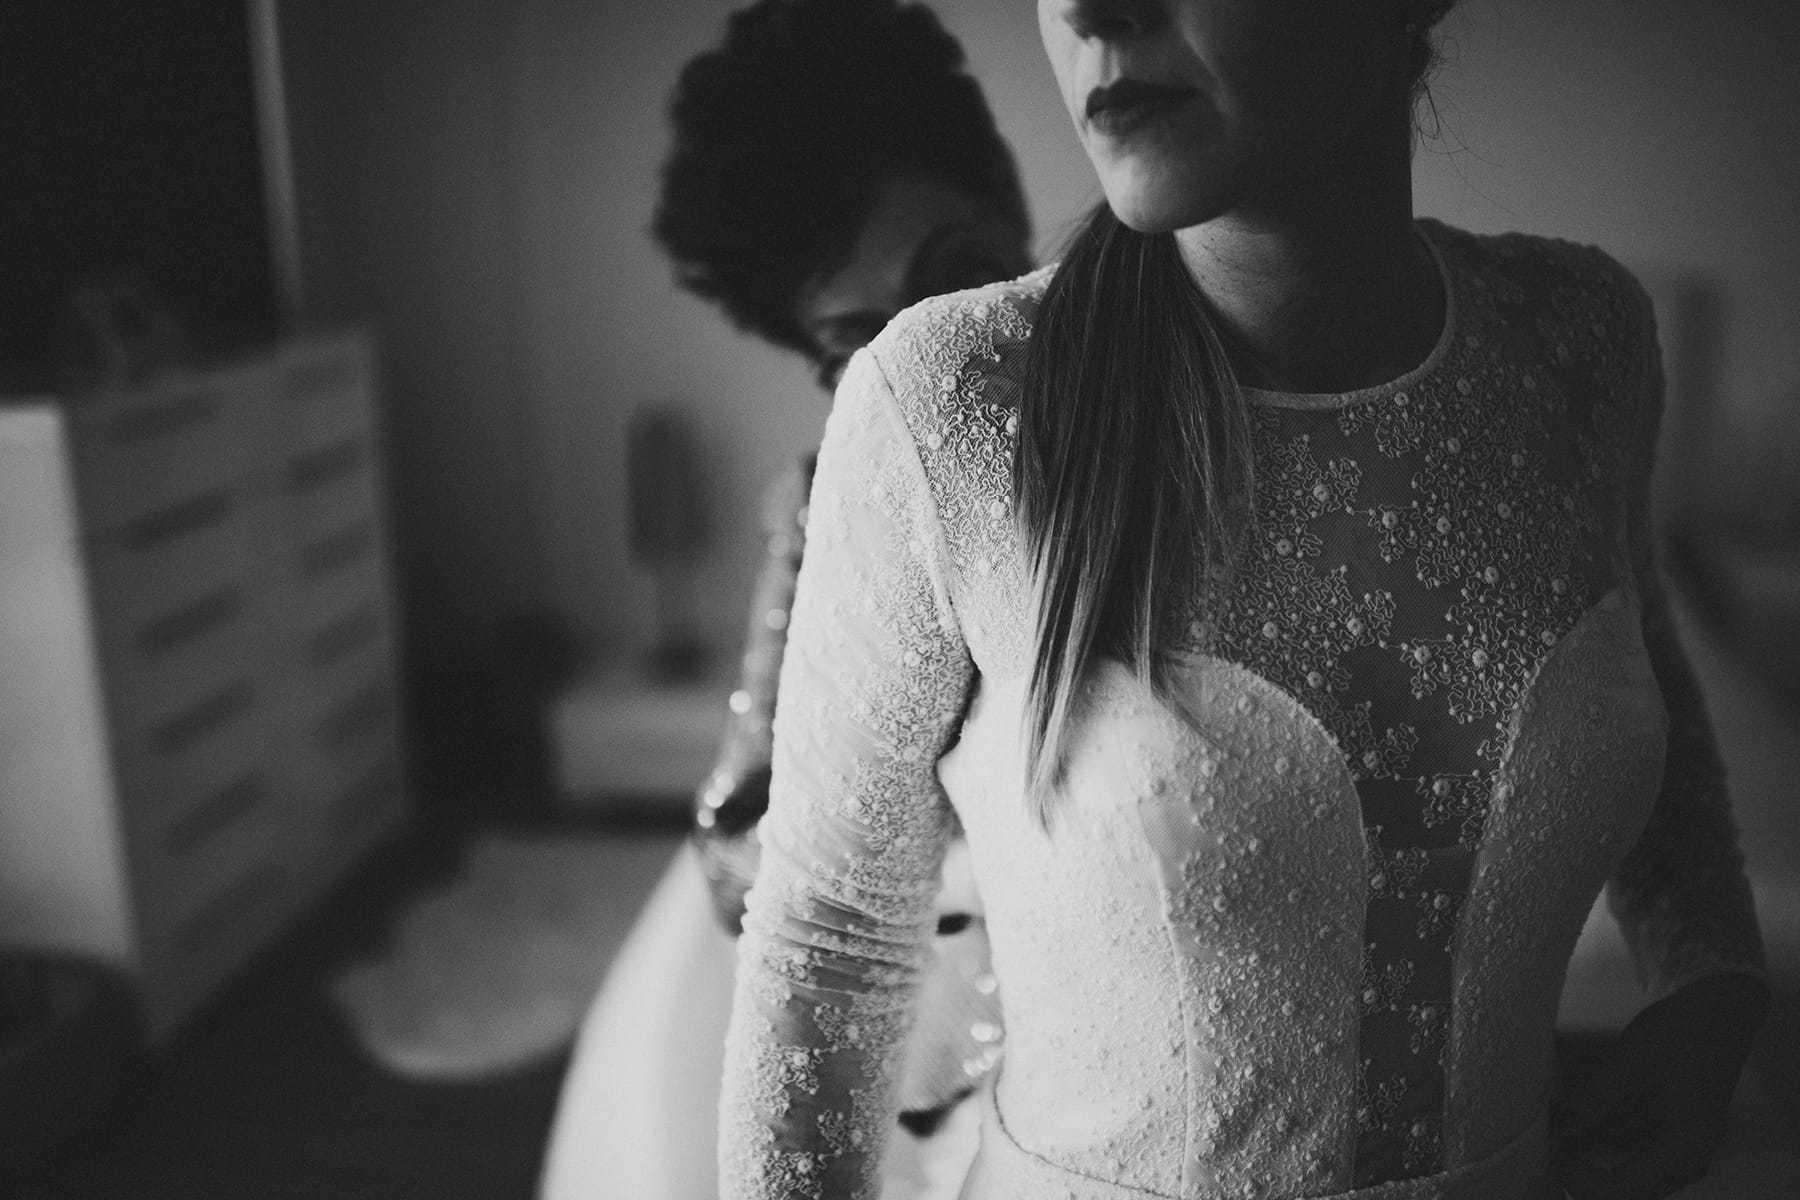 vestido_de_novia_otaduy_hilario_sanchez_fotografo_boda_barcelona_029